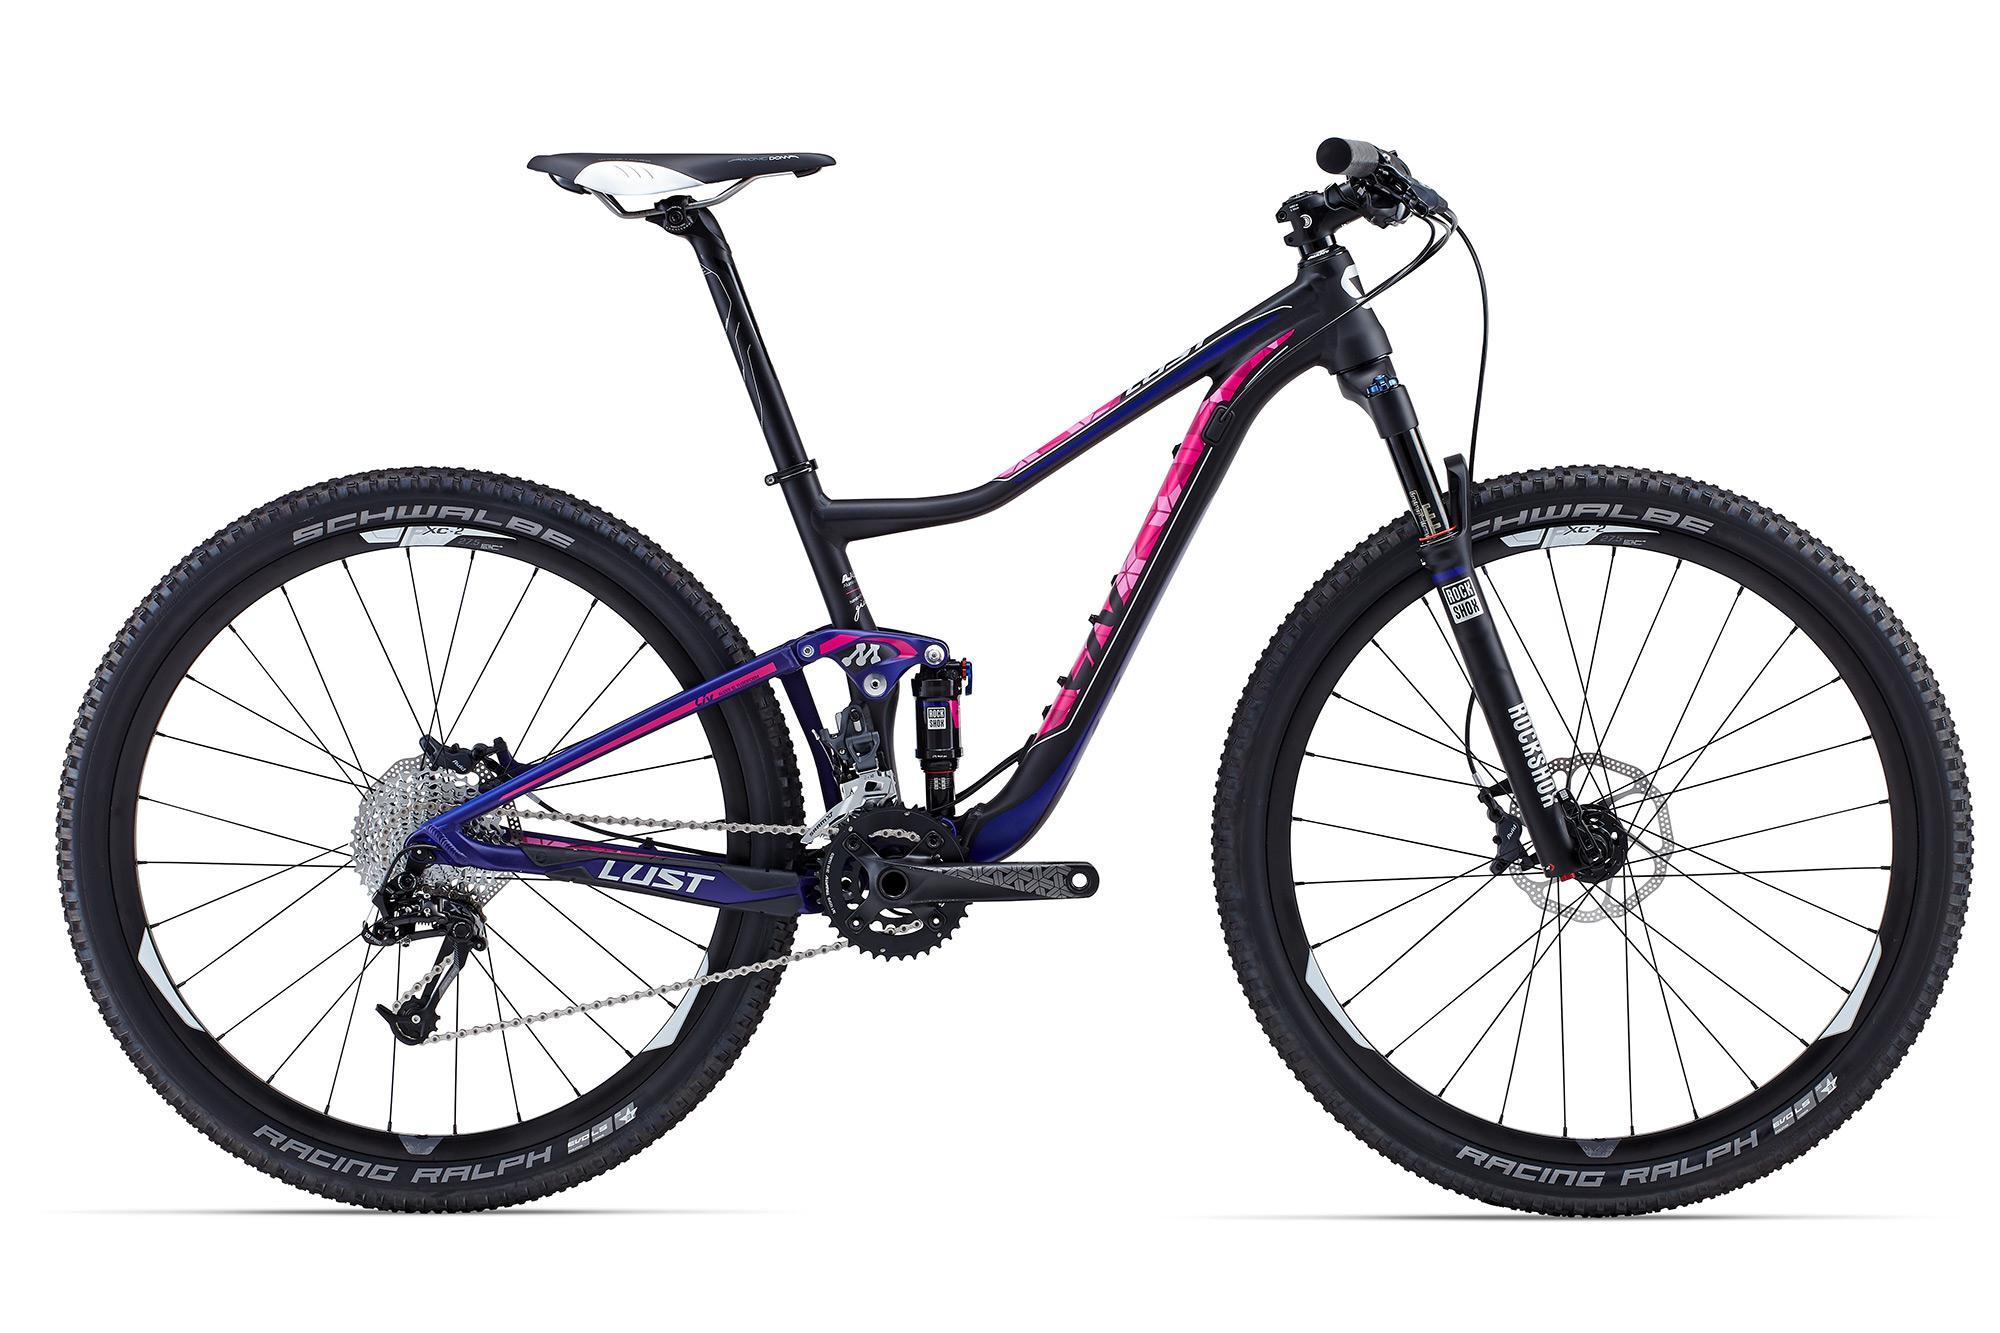 Xe dap the thao dia hinh GIANT Lust 1, xe dap the thao, xe dap trinx, xe đạp thể thao chính hãng, xe dap asama, Lust 1 Black